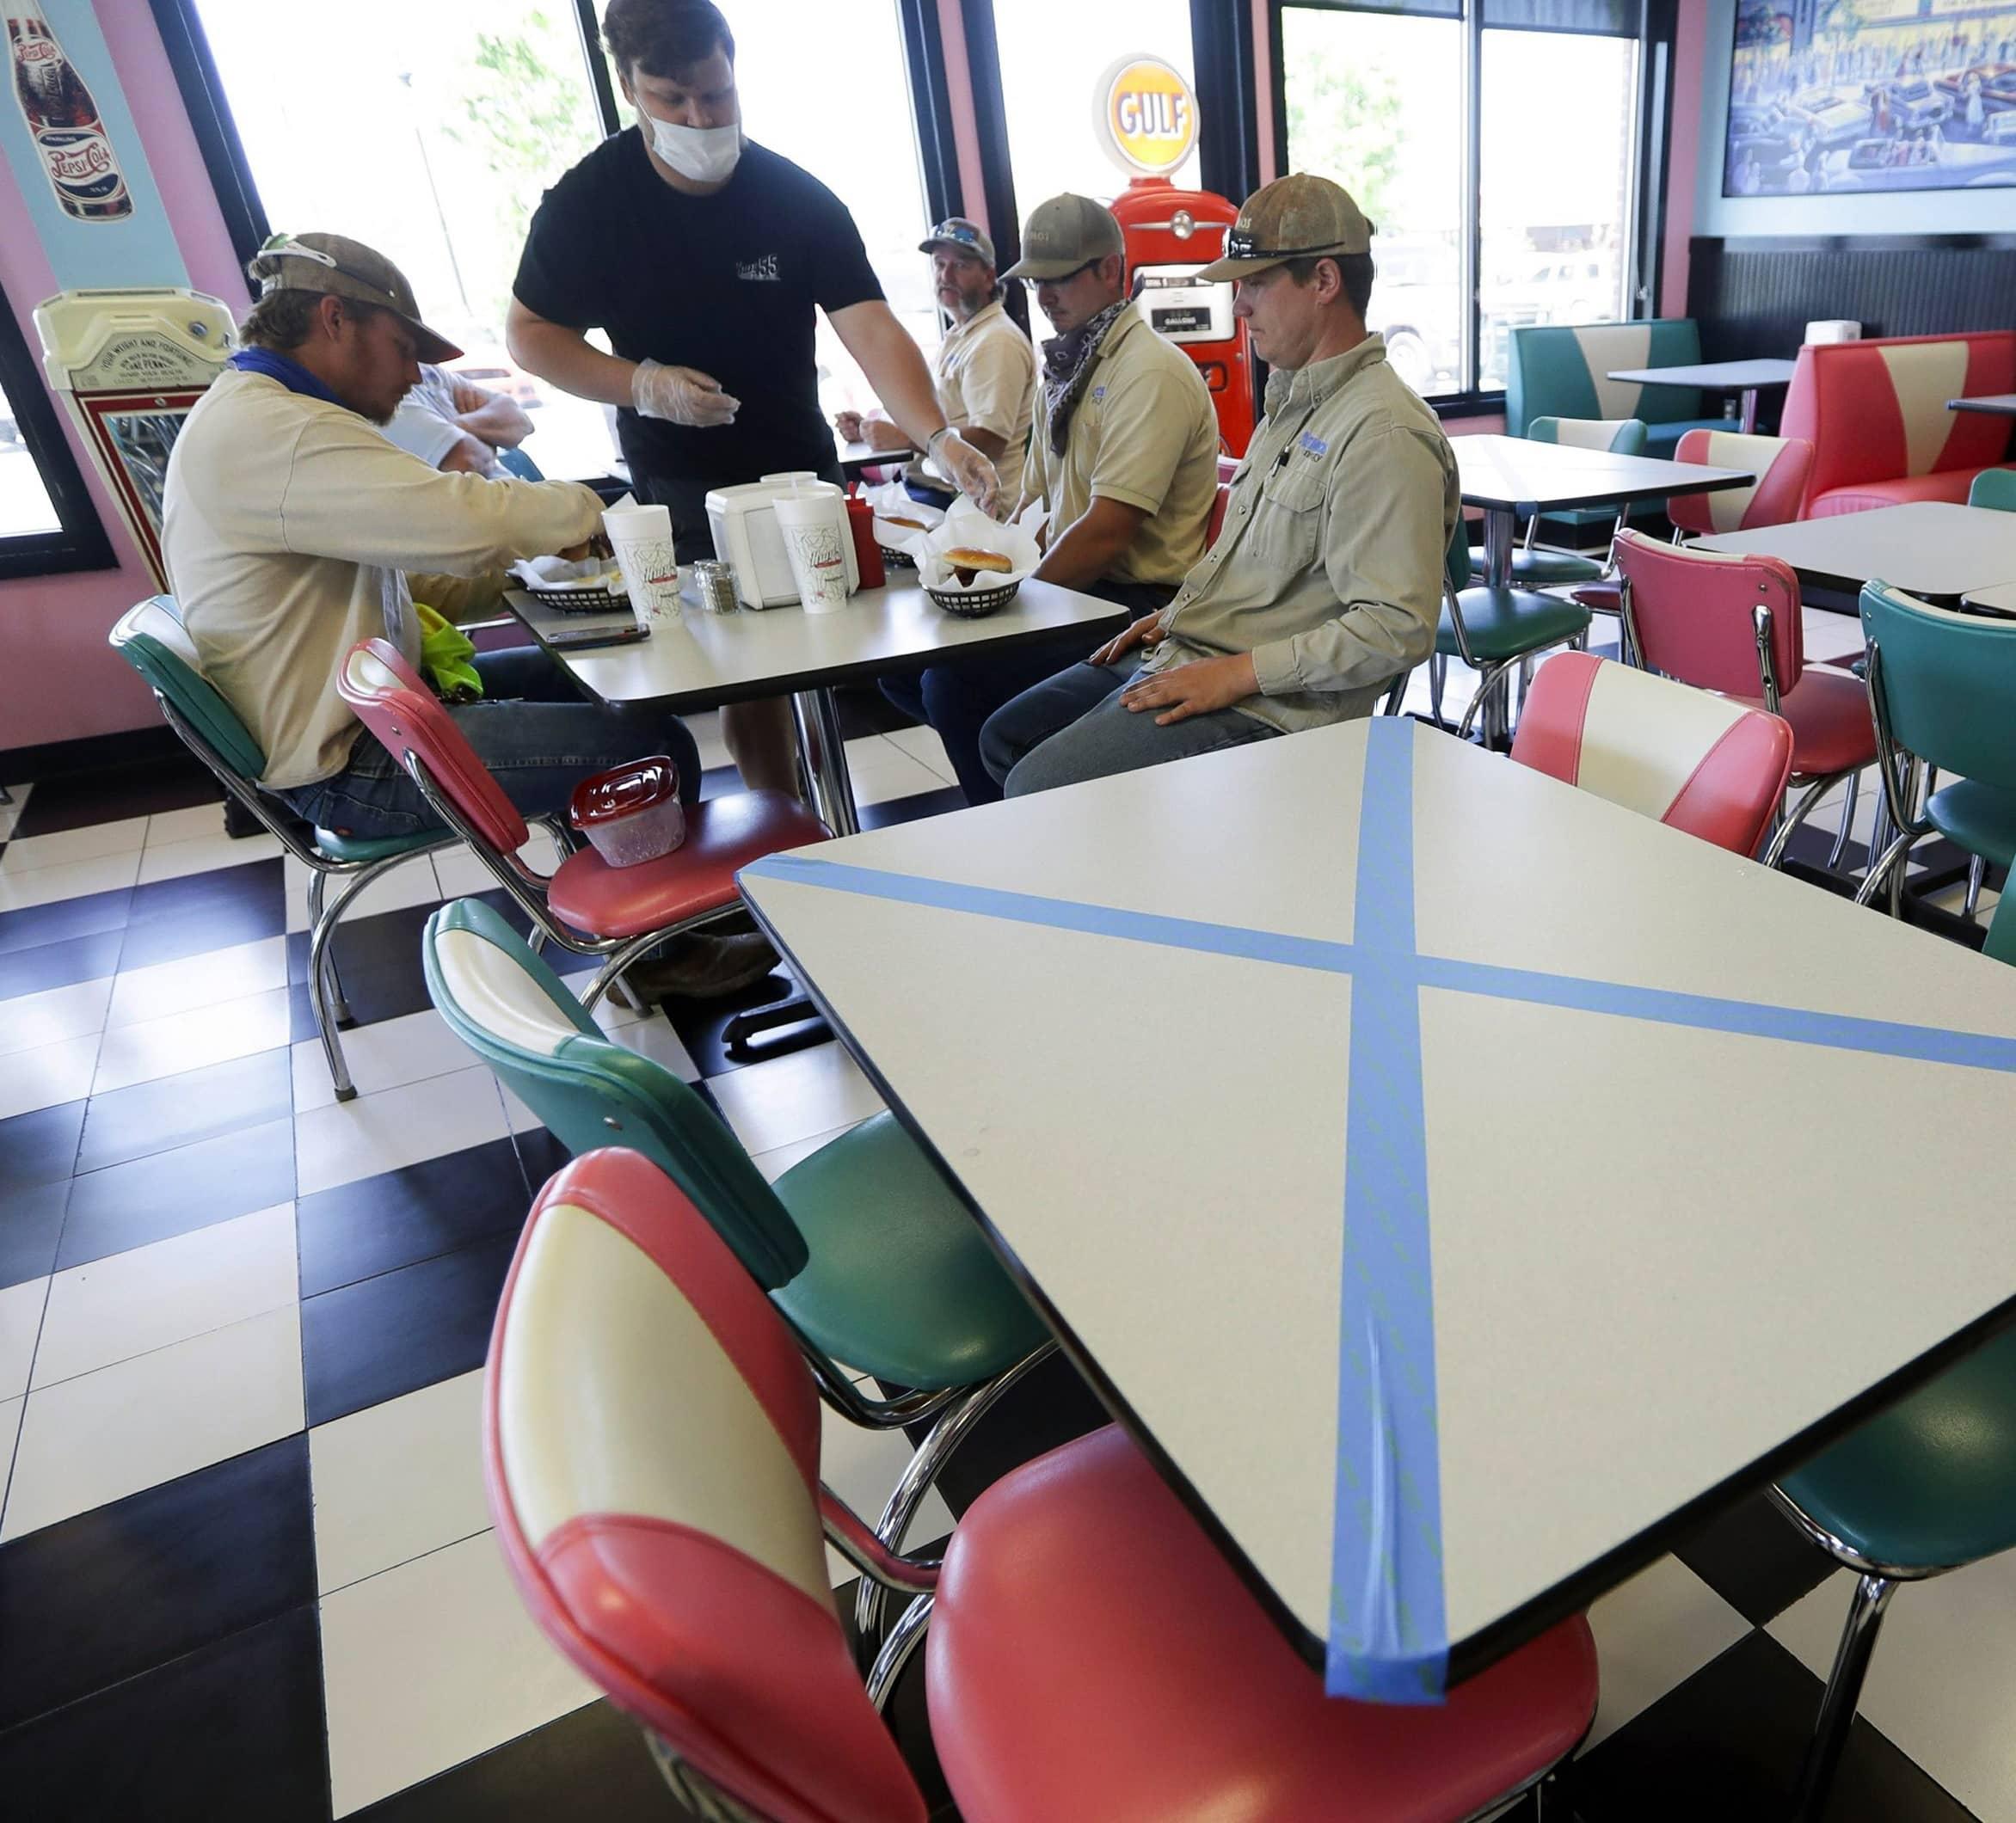 MASKS, TEMPERATURE CHECKS MARK 'NEW NORMAL' AT RESTAURANTS